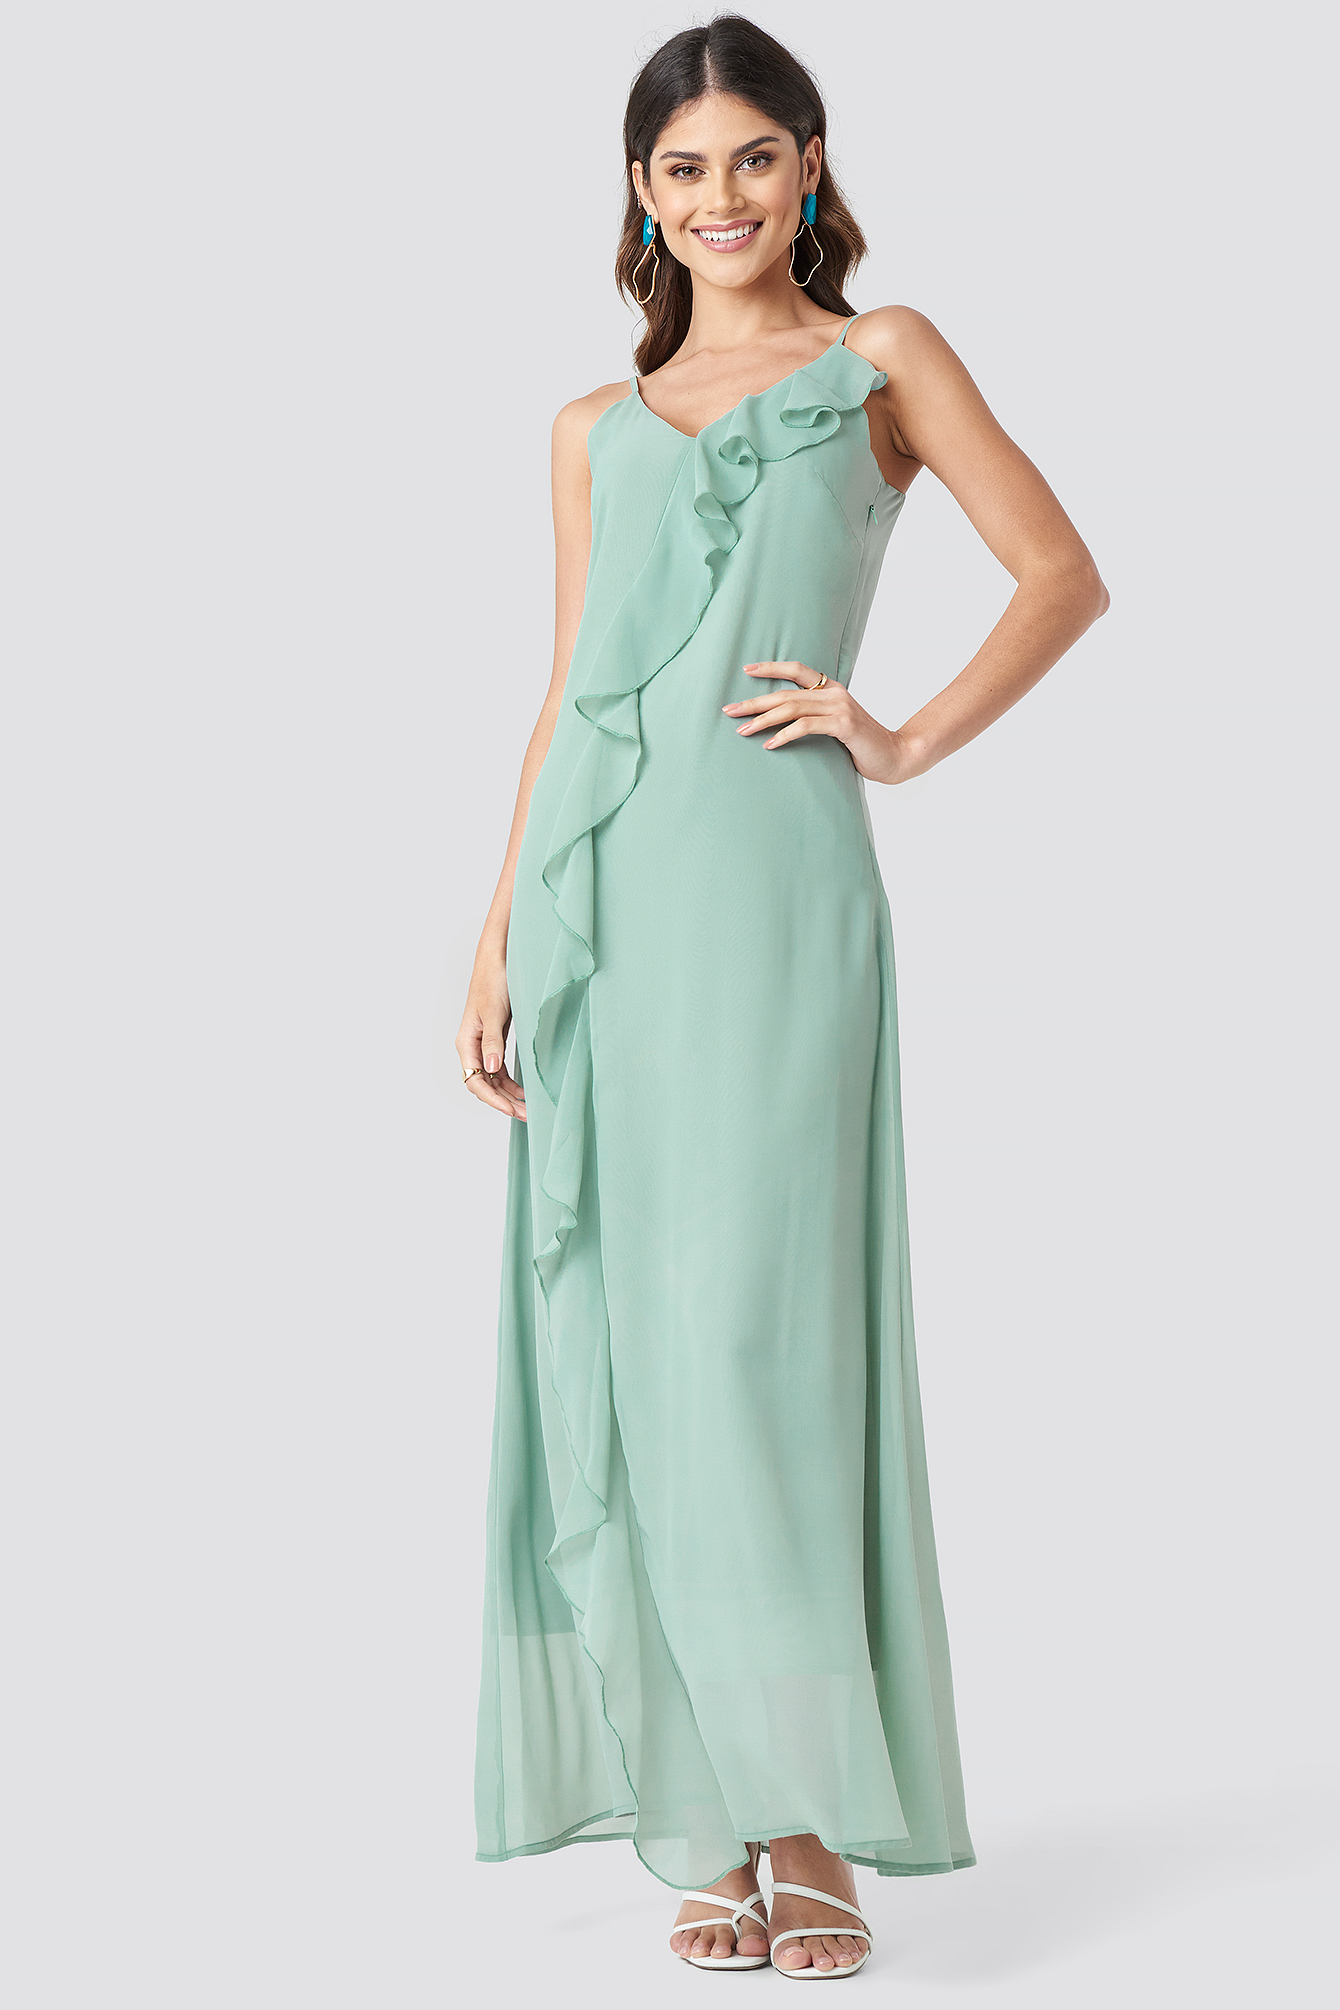 Thin Strap Ruffle Detail Dress NA-KD.COM